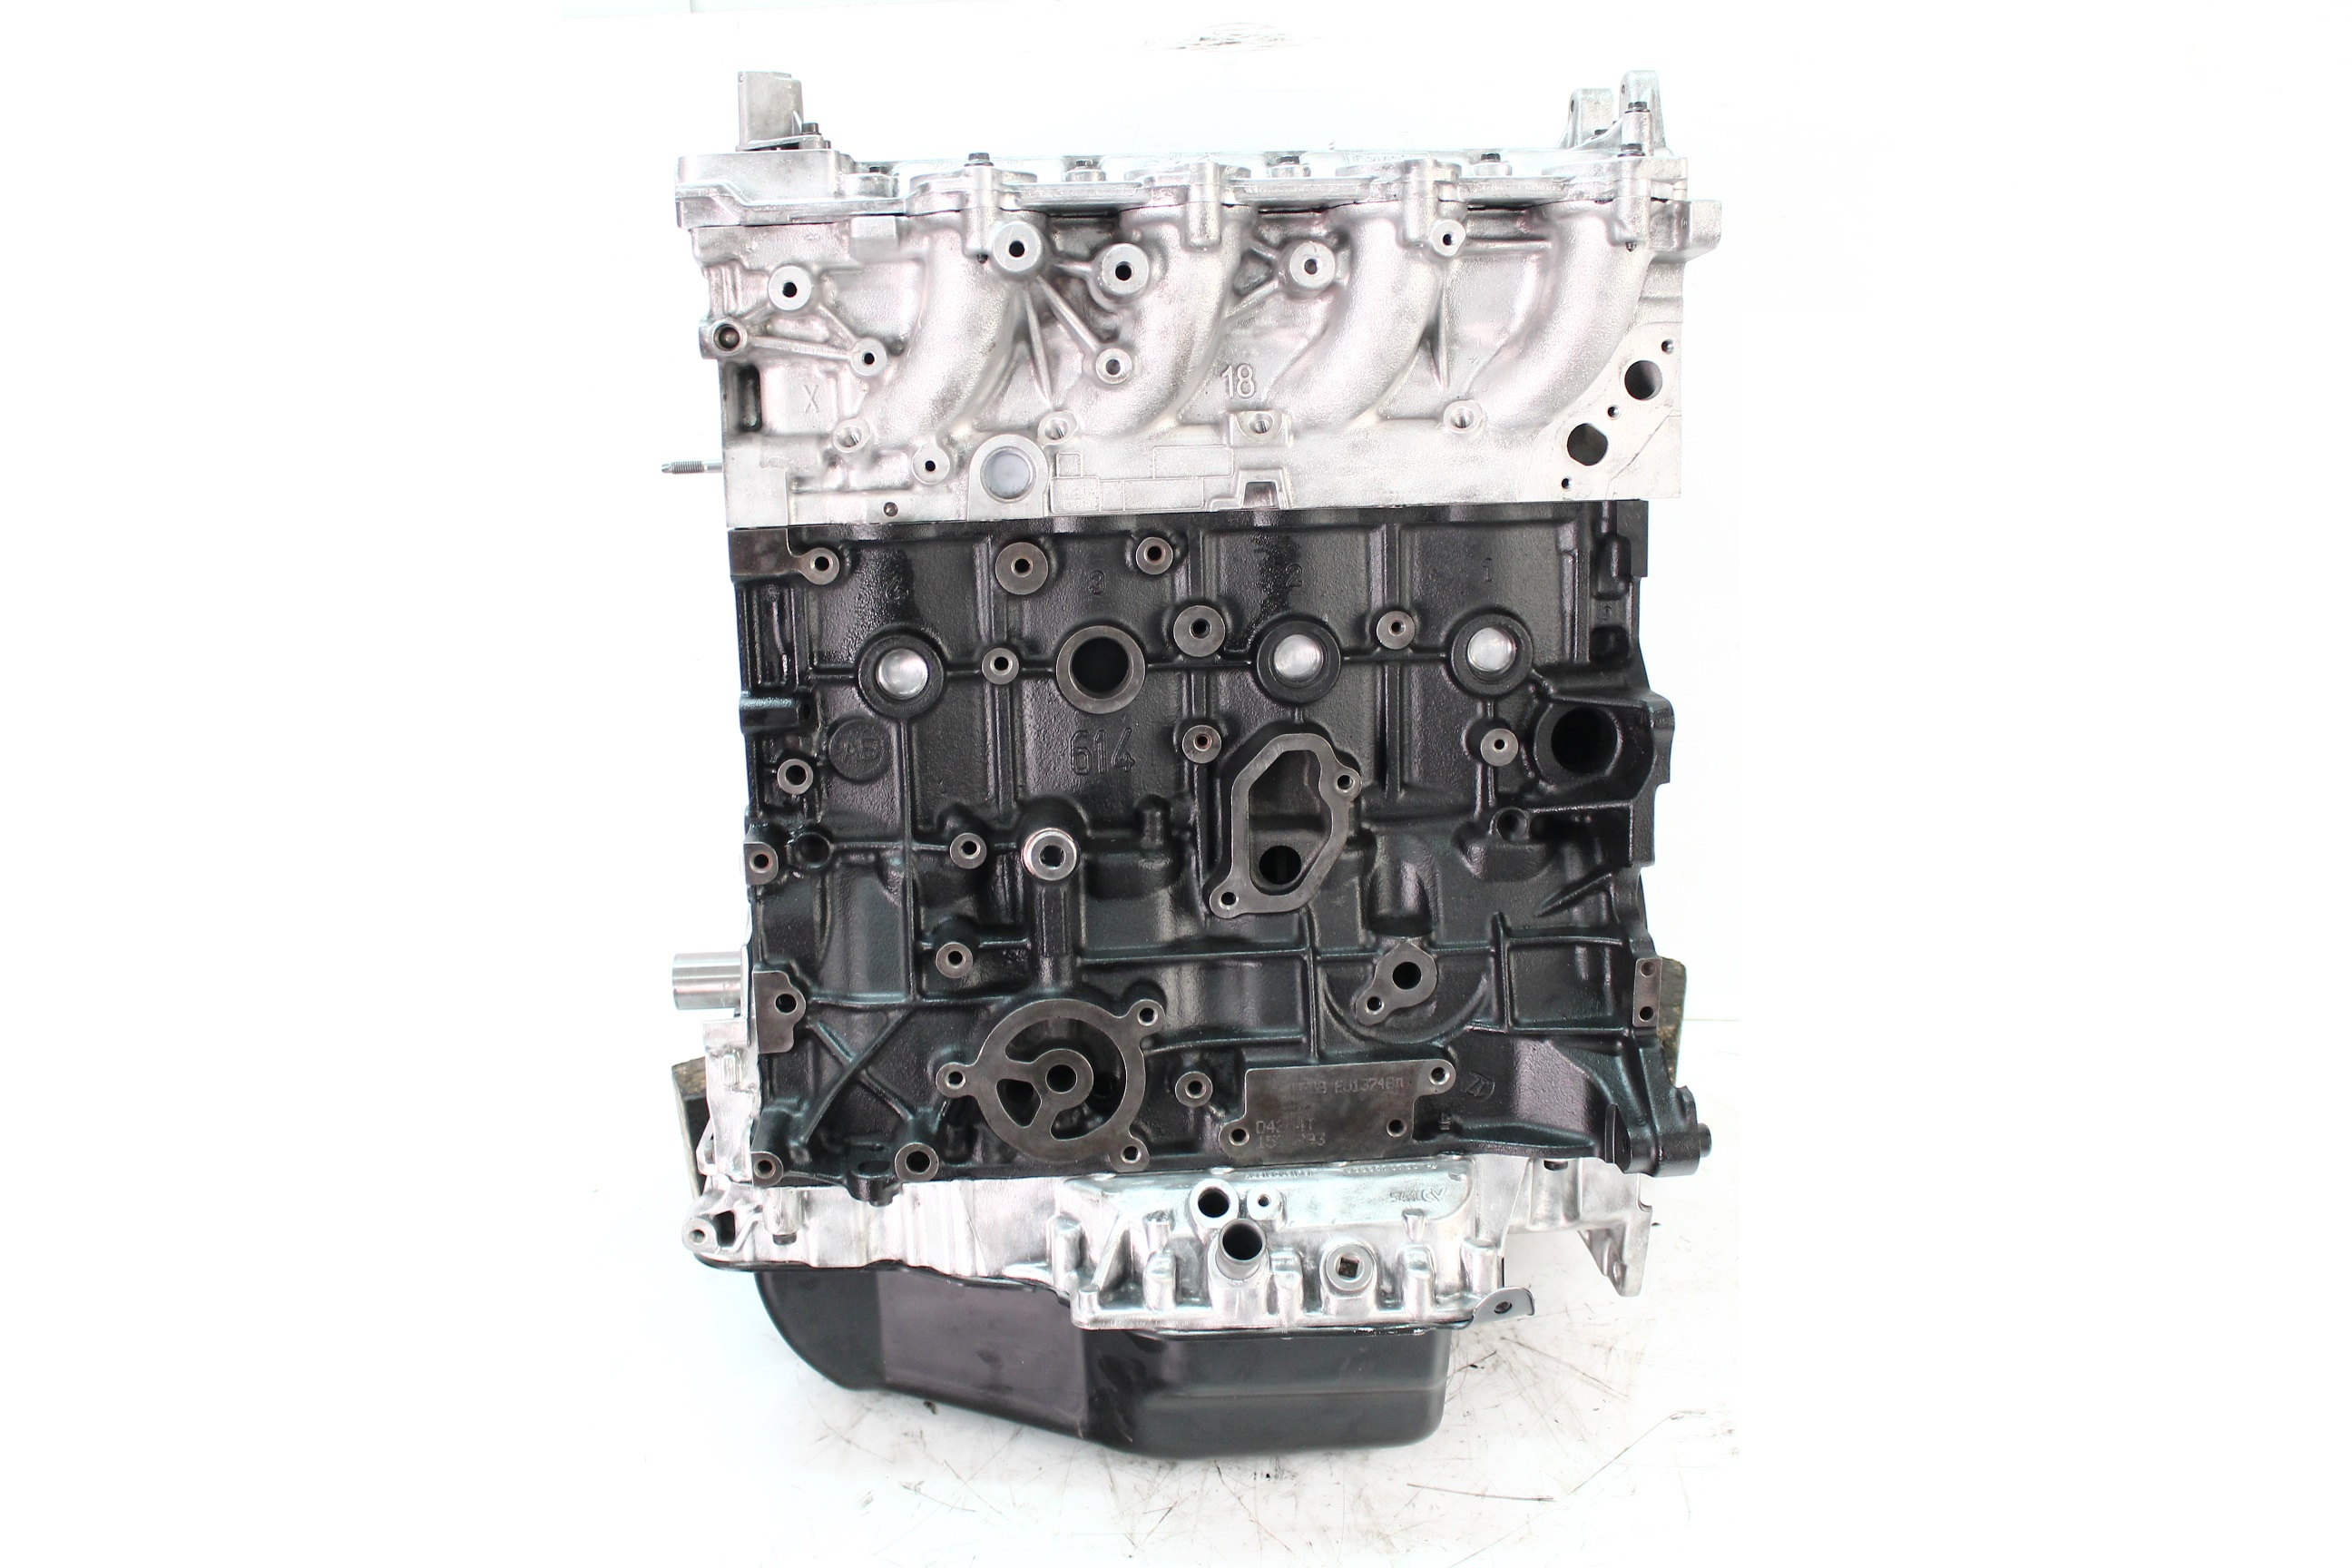 Motor 2010 Ford Mondeo IV 2,0 TDCi Diesel UFBB UFBA 140 PS Dichtungen NEU